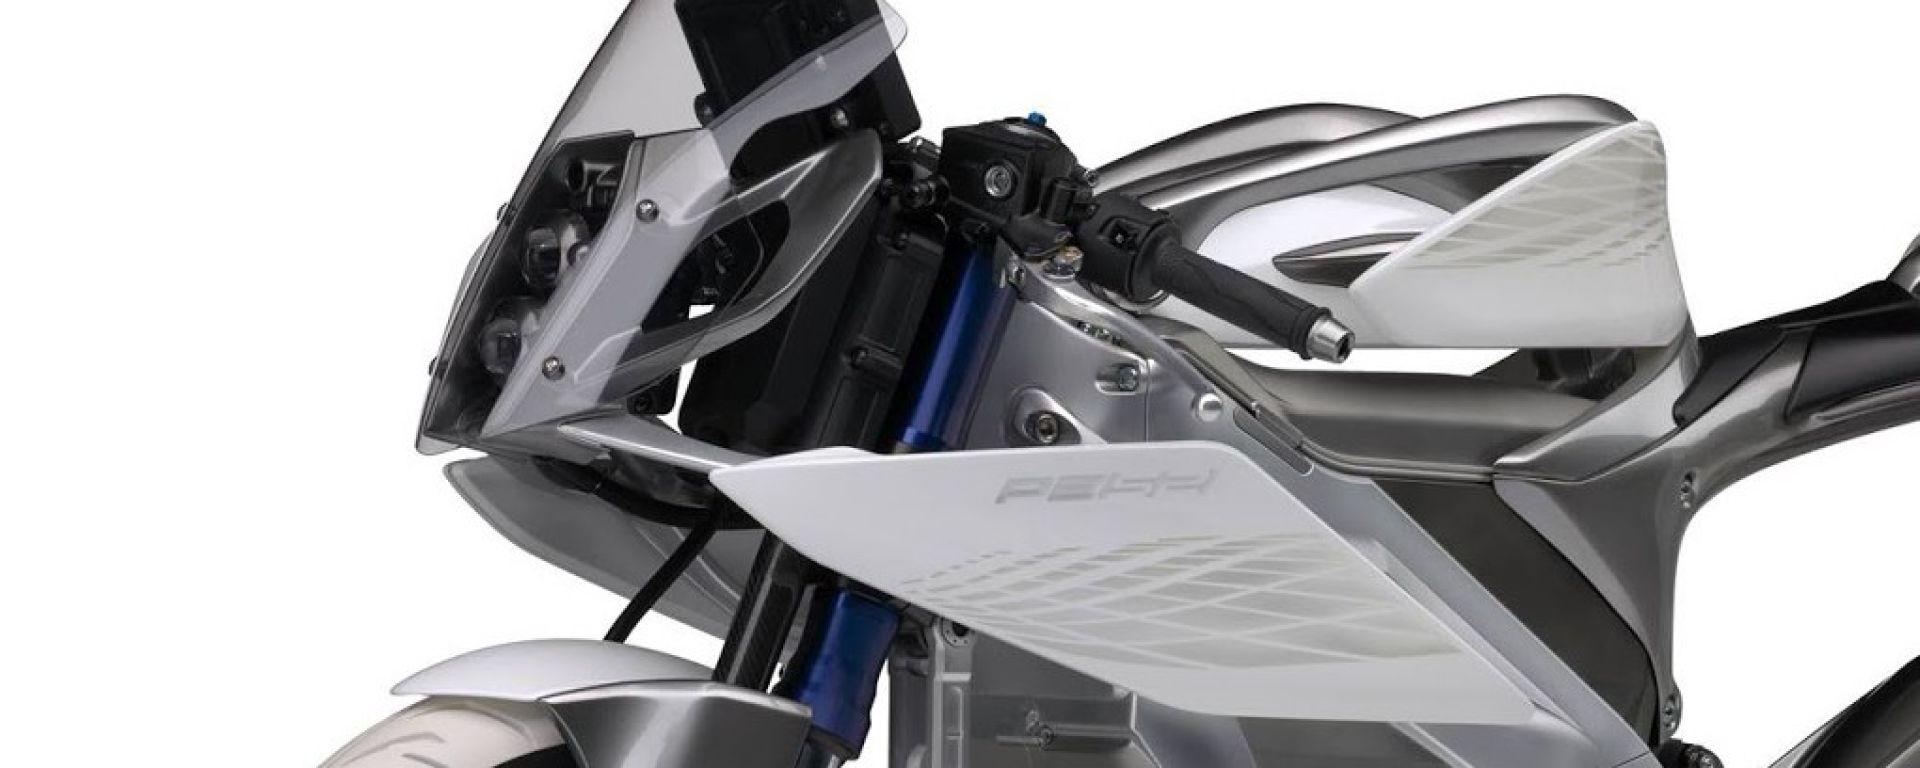 Yamaha PES2: la moto a due ruote motrici